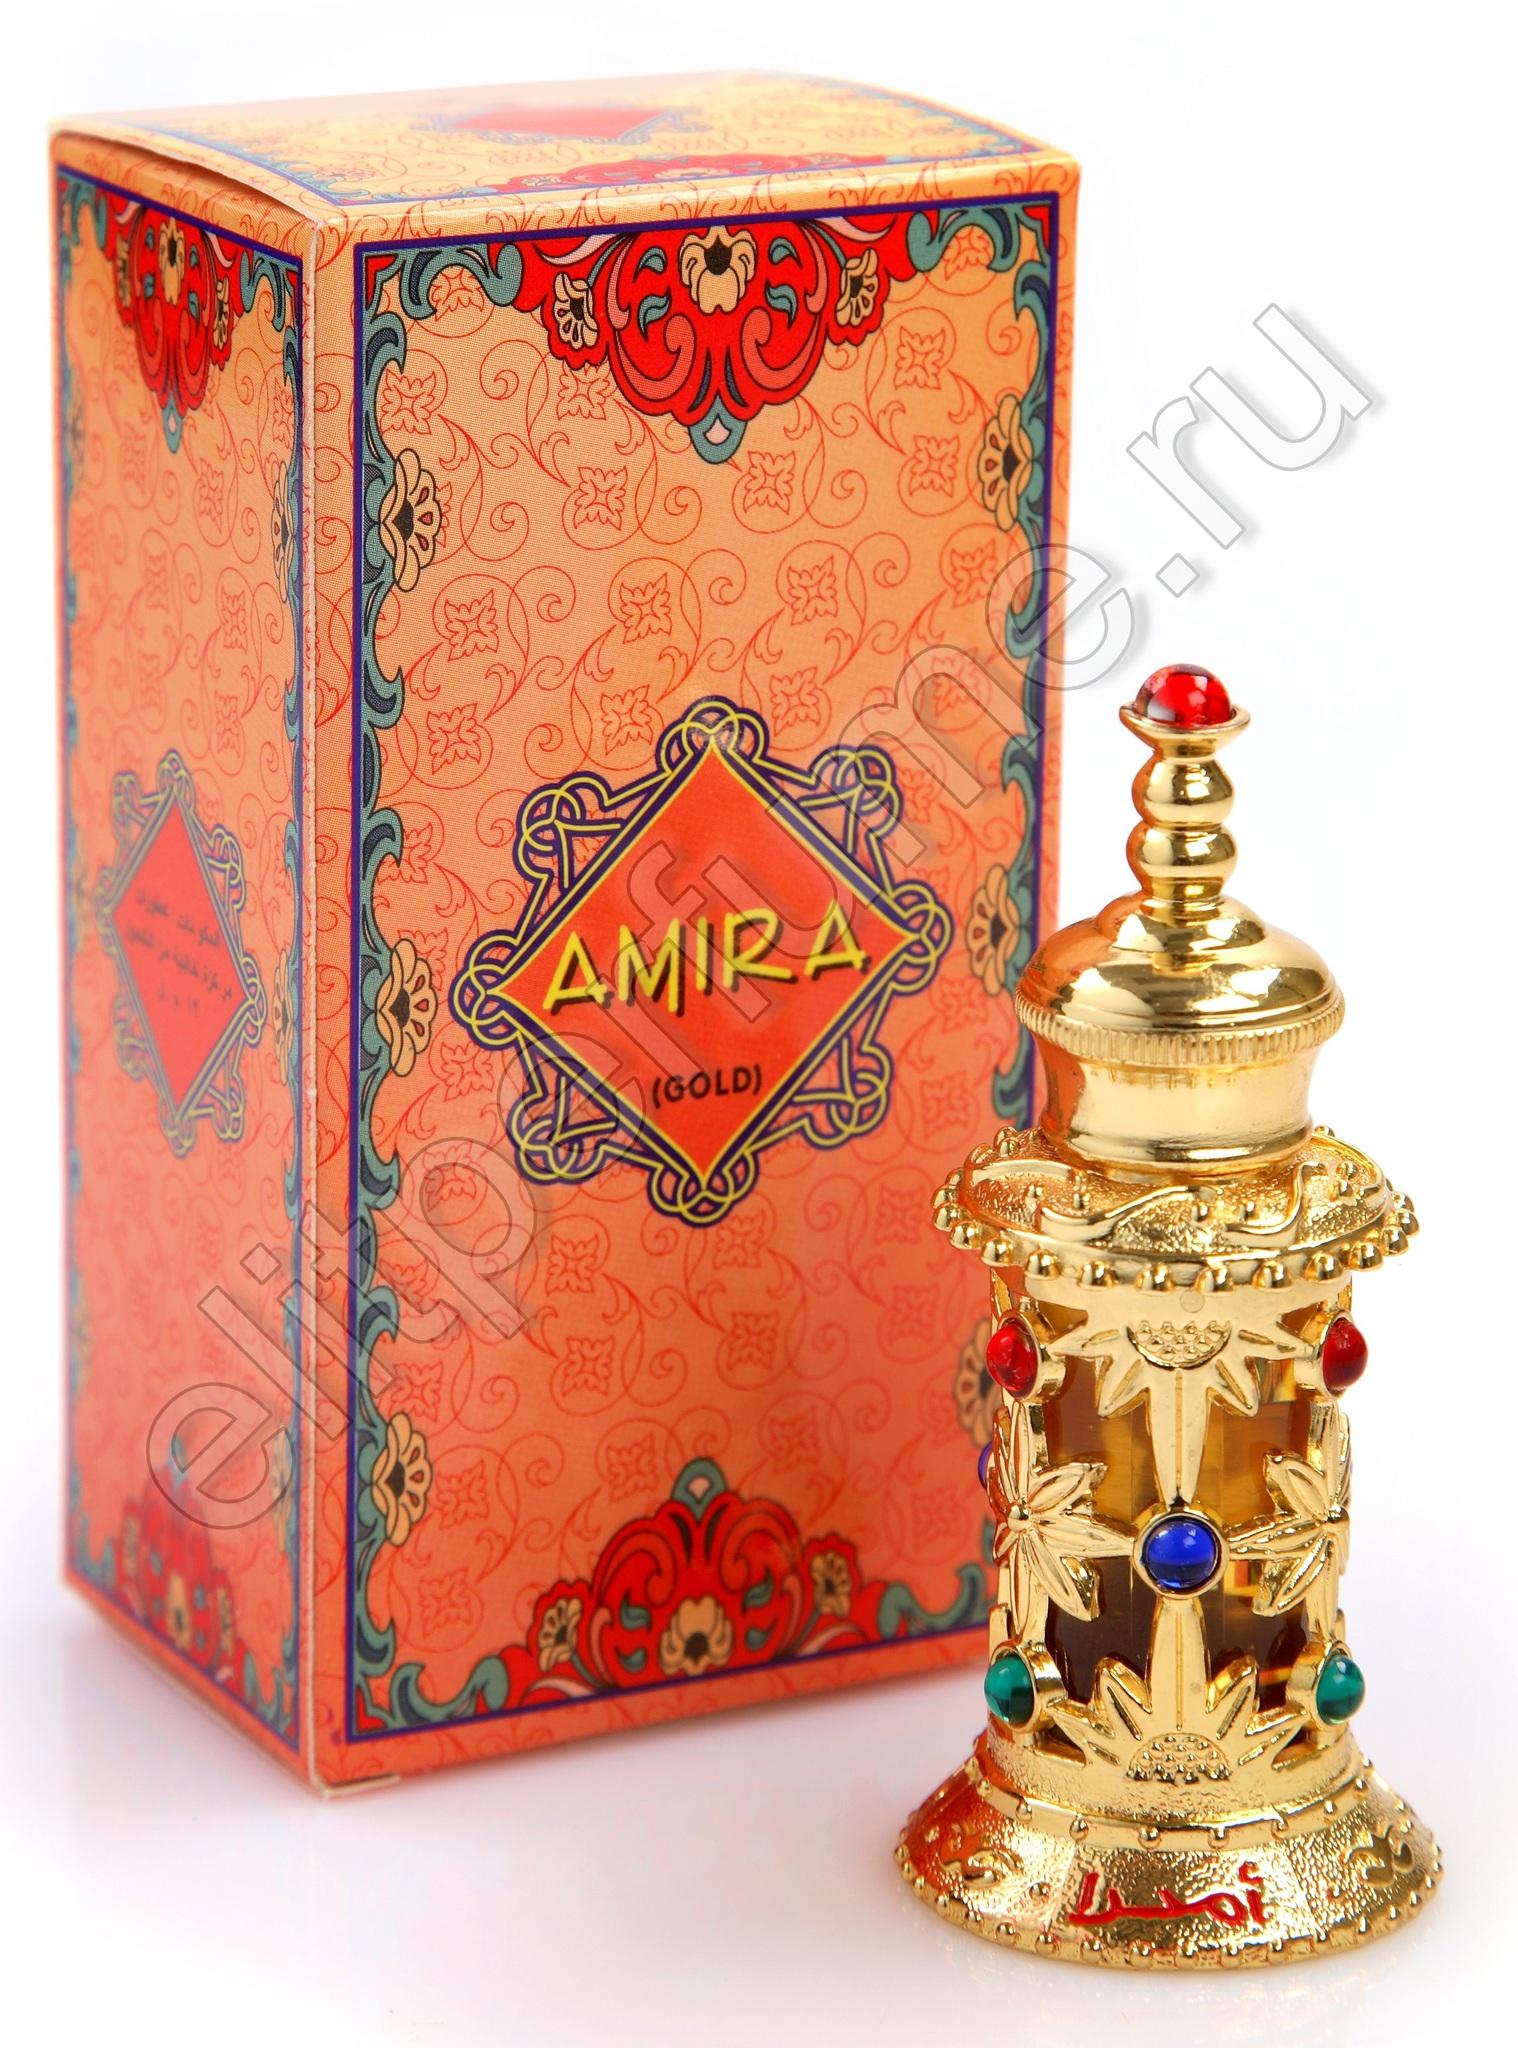 Пробники для духов Амира Золото Amira Gold 1 мл арабские масляные духи от Аль Харамайн Al Haramin Perfumes